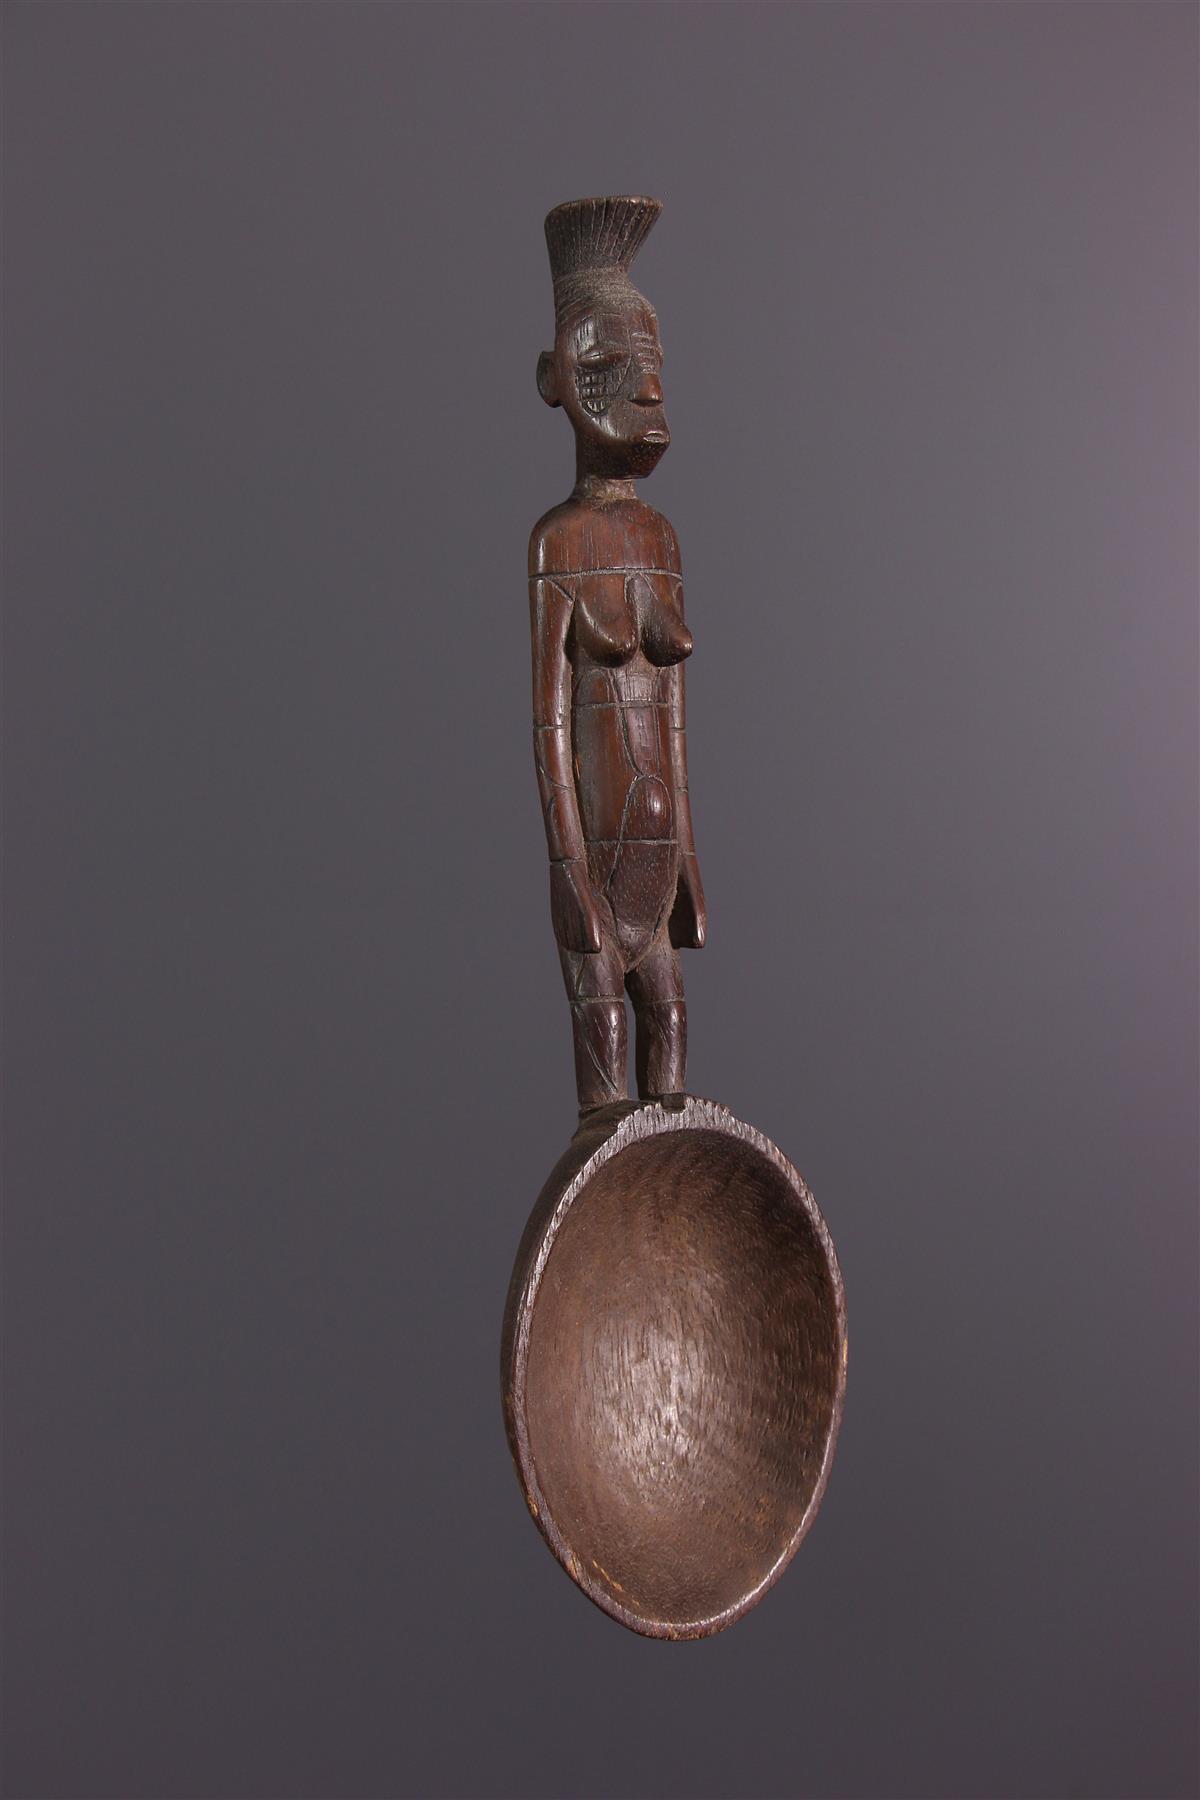 Spoon Mangbetu - African art